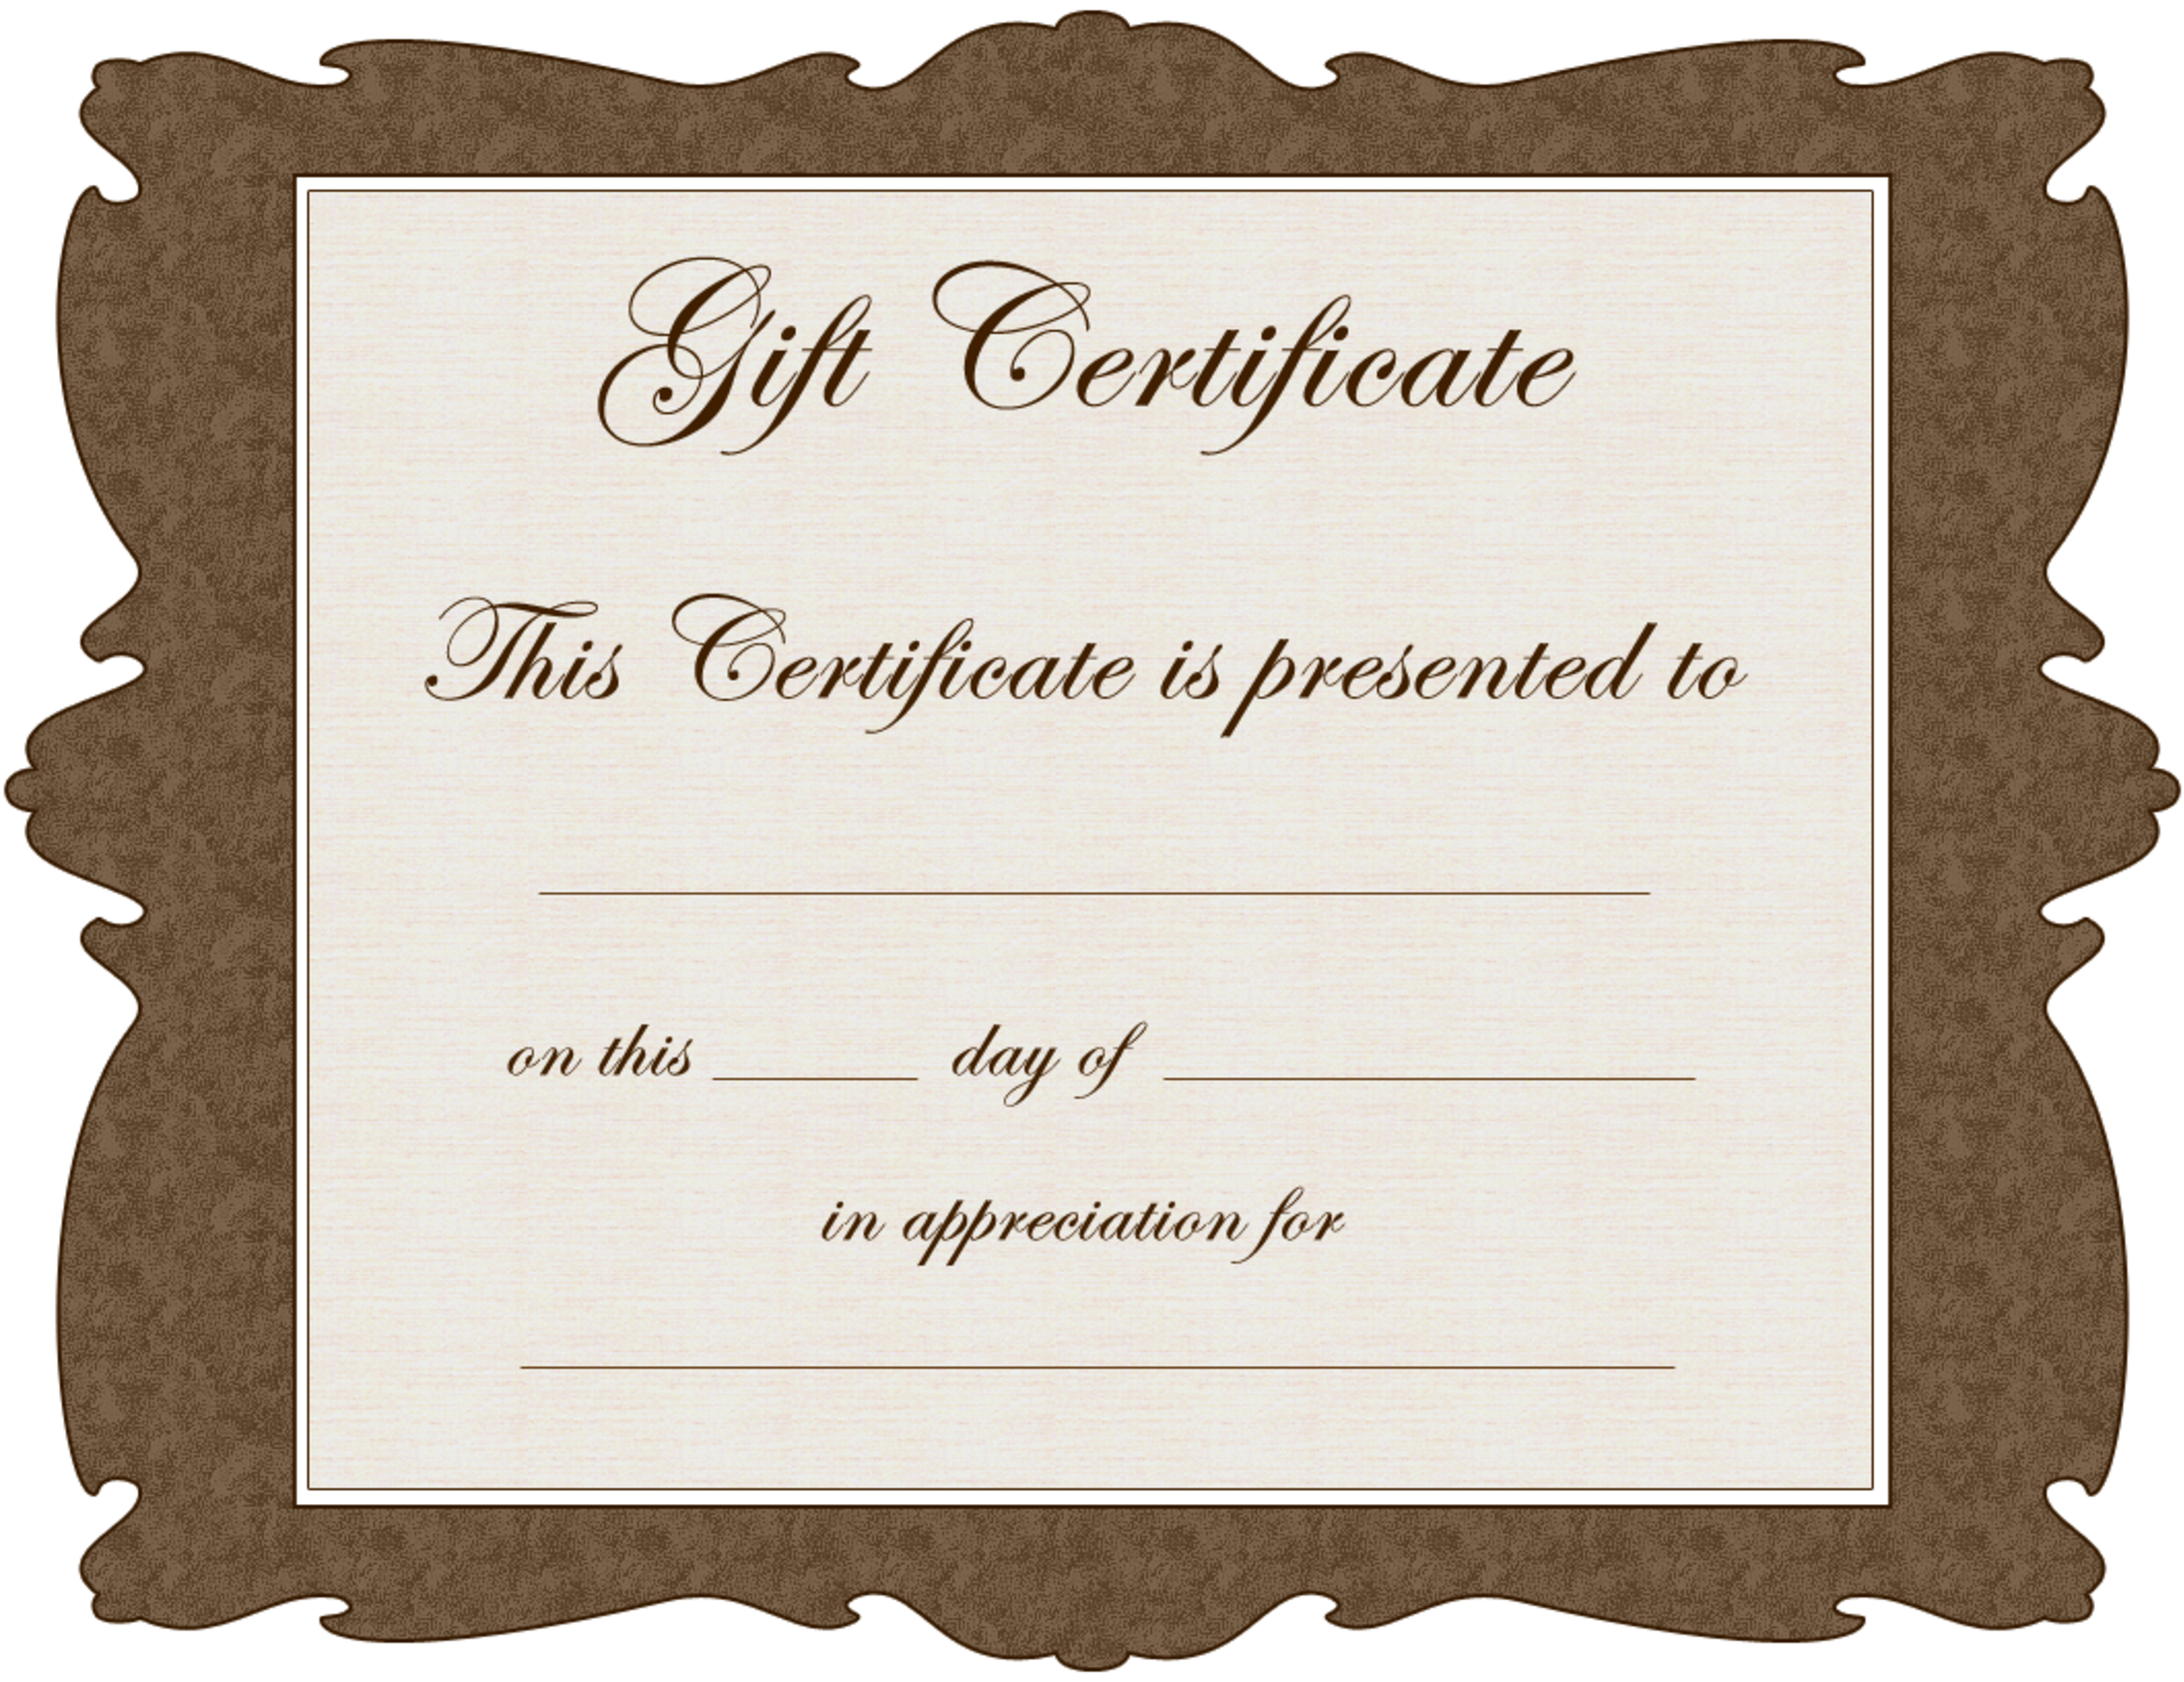 Recognition Certificates Wording Make Missing Poster Personnel  070e734287e8610f611004f048d4e579 Recognition Certificates Wordinghtml  Certificate Of Achievement Wording